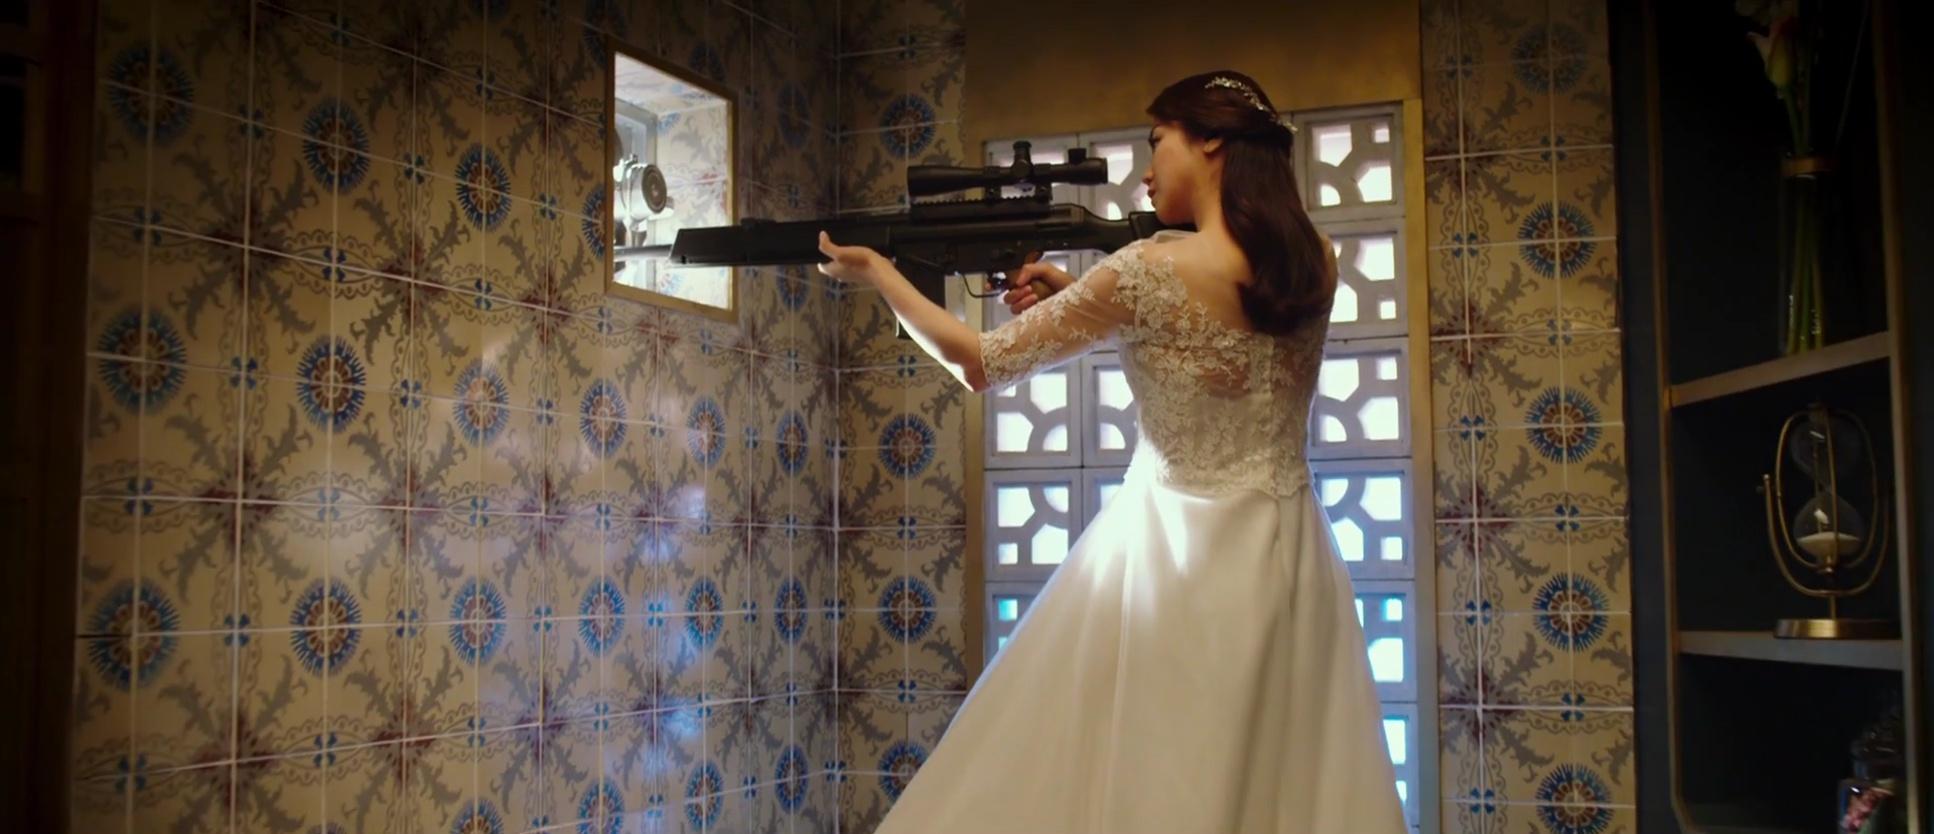 THE VILLAINESS (악녀) de Jung Byung-gil (2017)